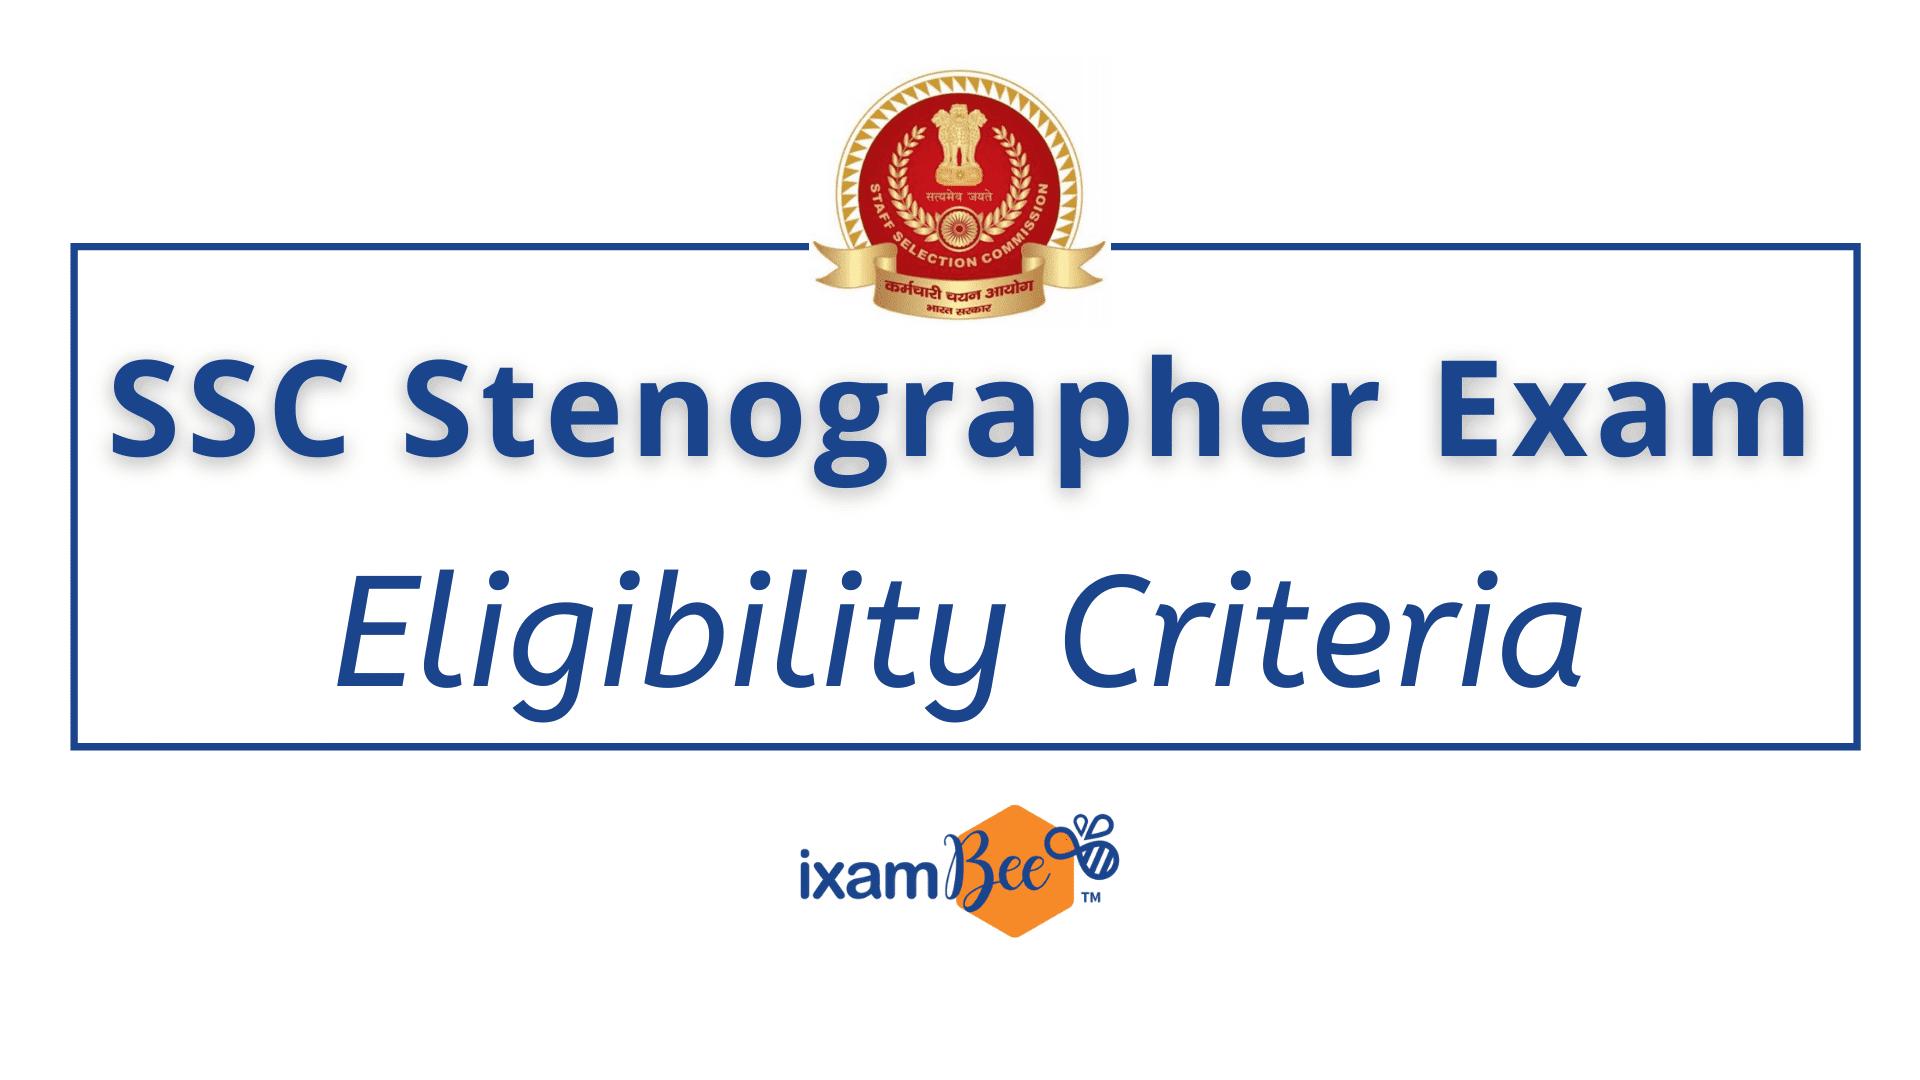 SSC-Stenographer-Eligibility-Criteria